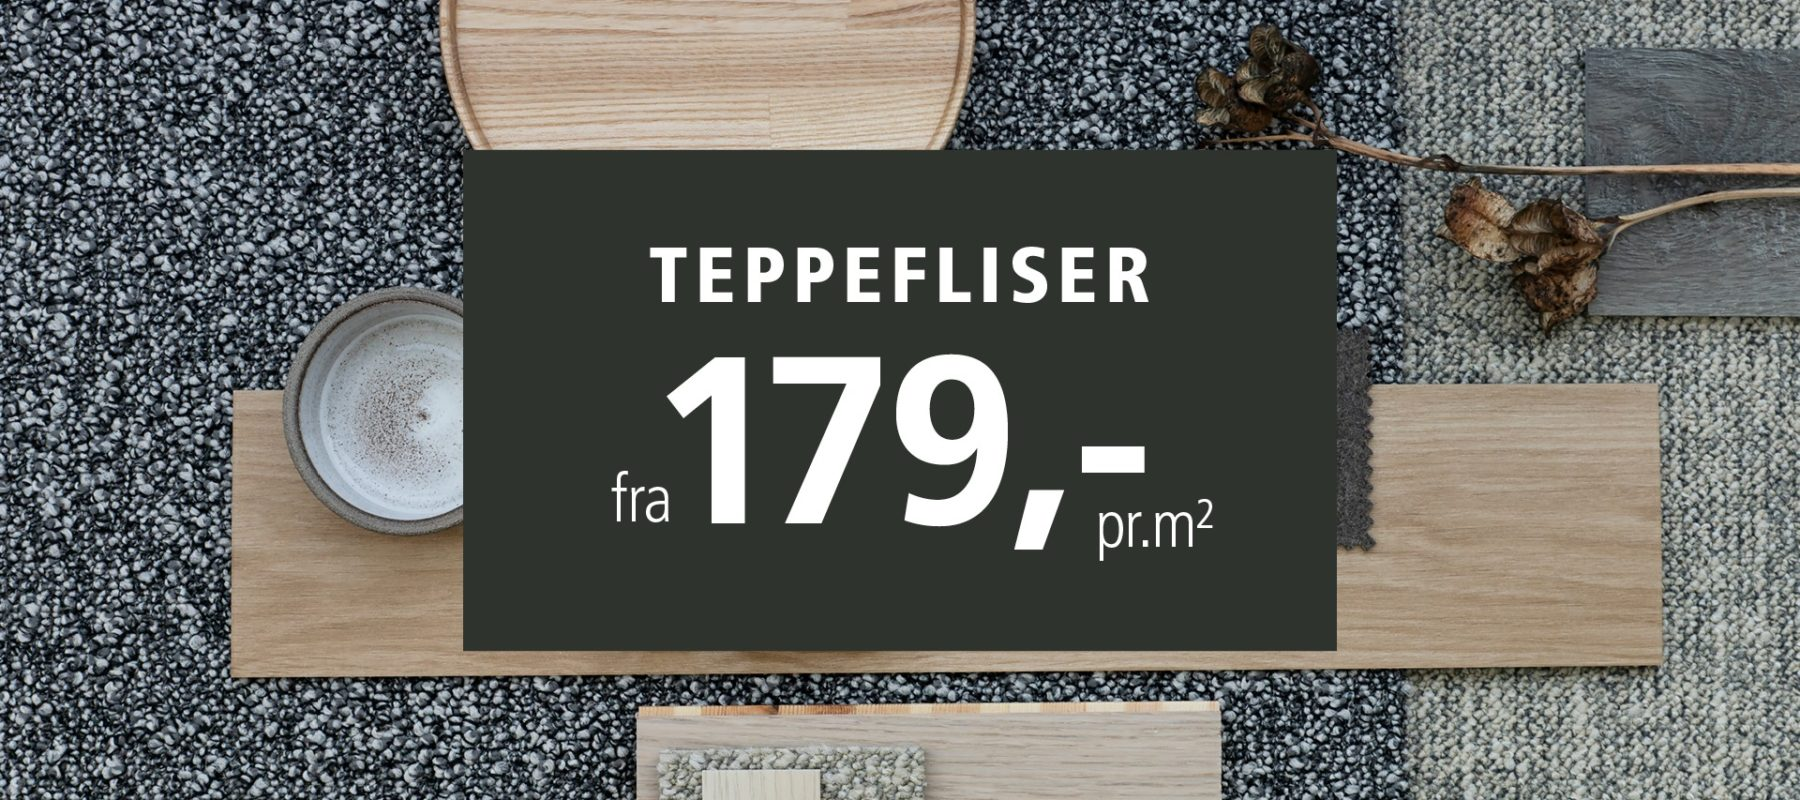 Nysted-kampanje17-1920x1080px-teppefliser